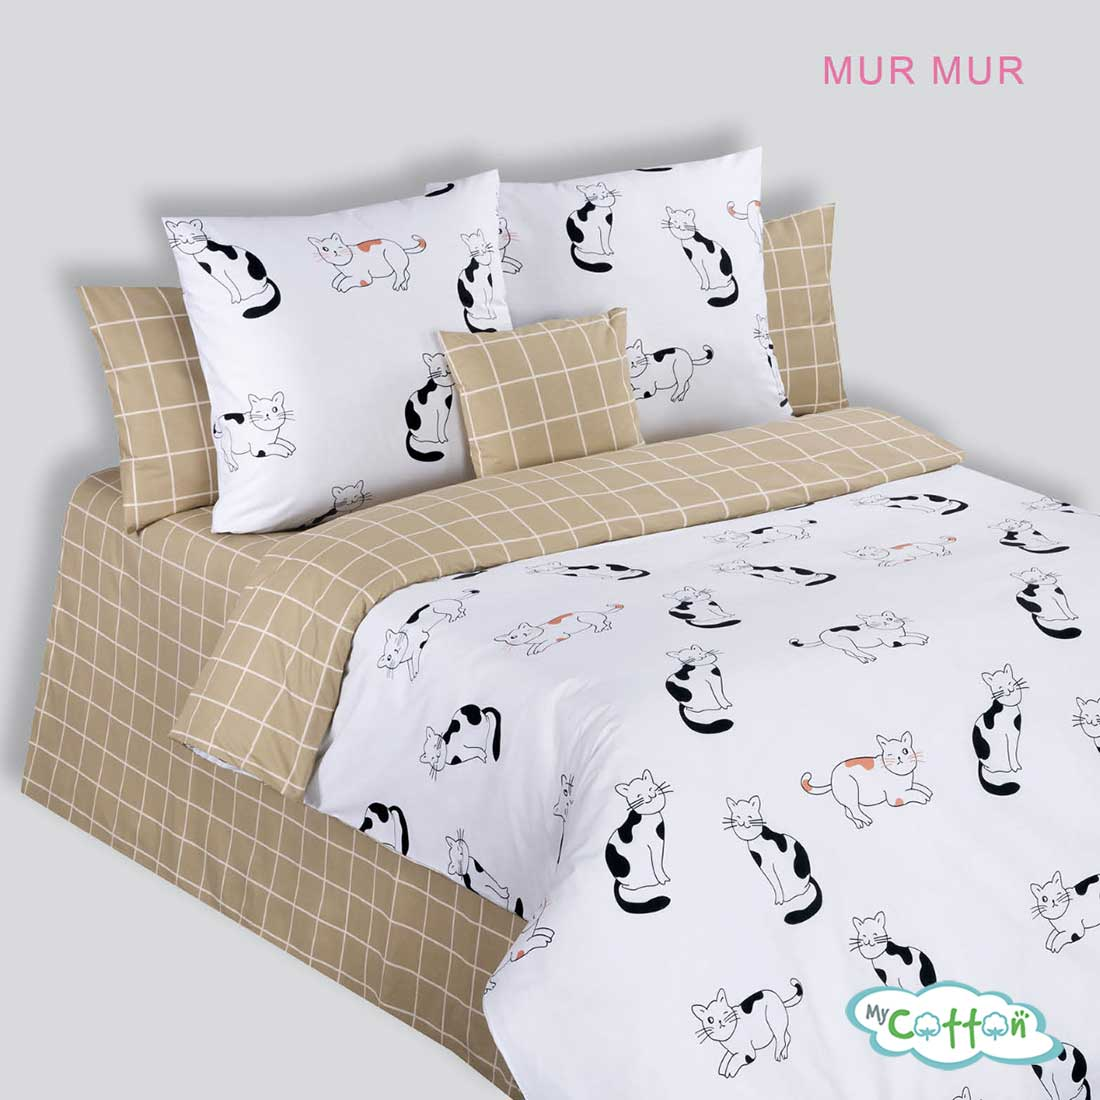 Постельное белье Mur Mur (Мур Мур)